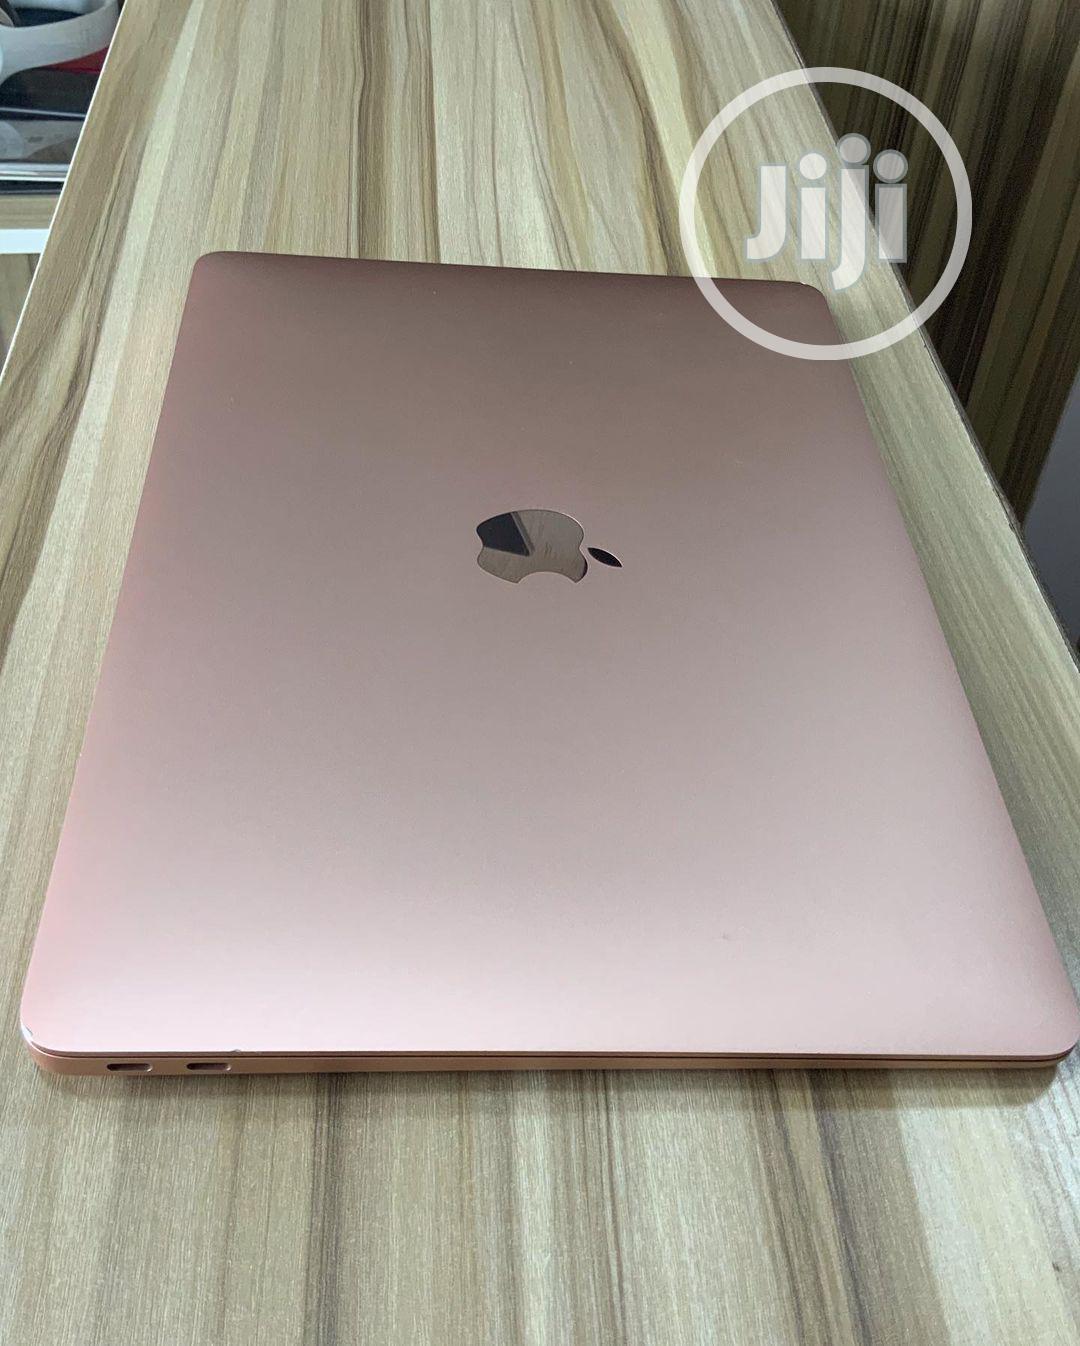 Laptop Apple MacBook 2018 8GB Intel Core I5 SSD 256GB | Laptops & Computers for sale in Ikeja, Lagos State, Nigeria